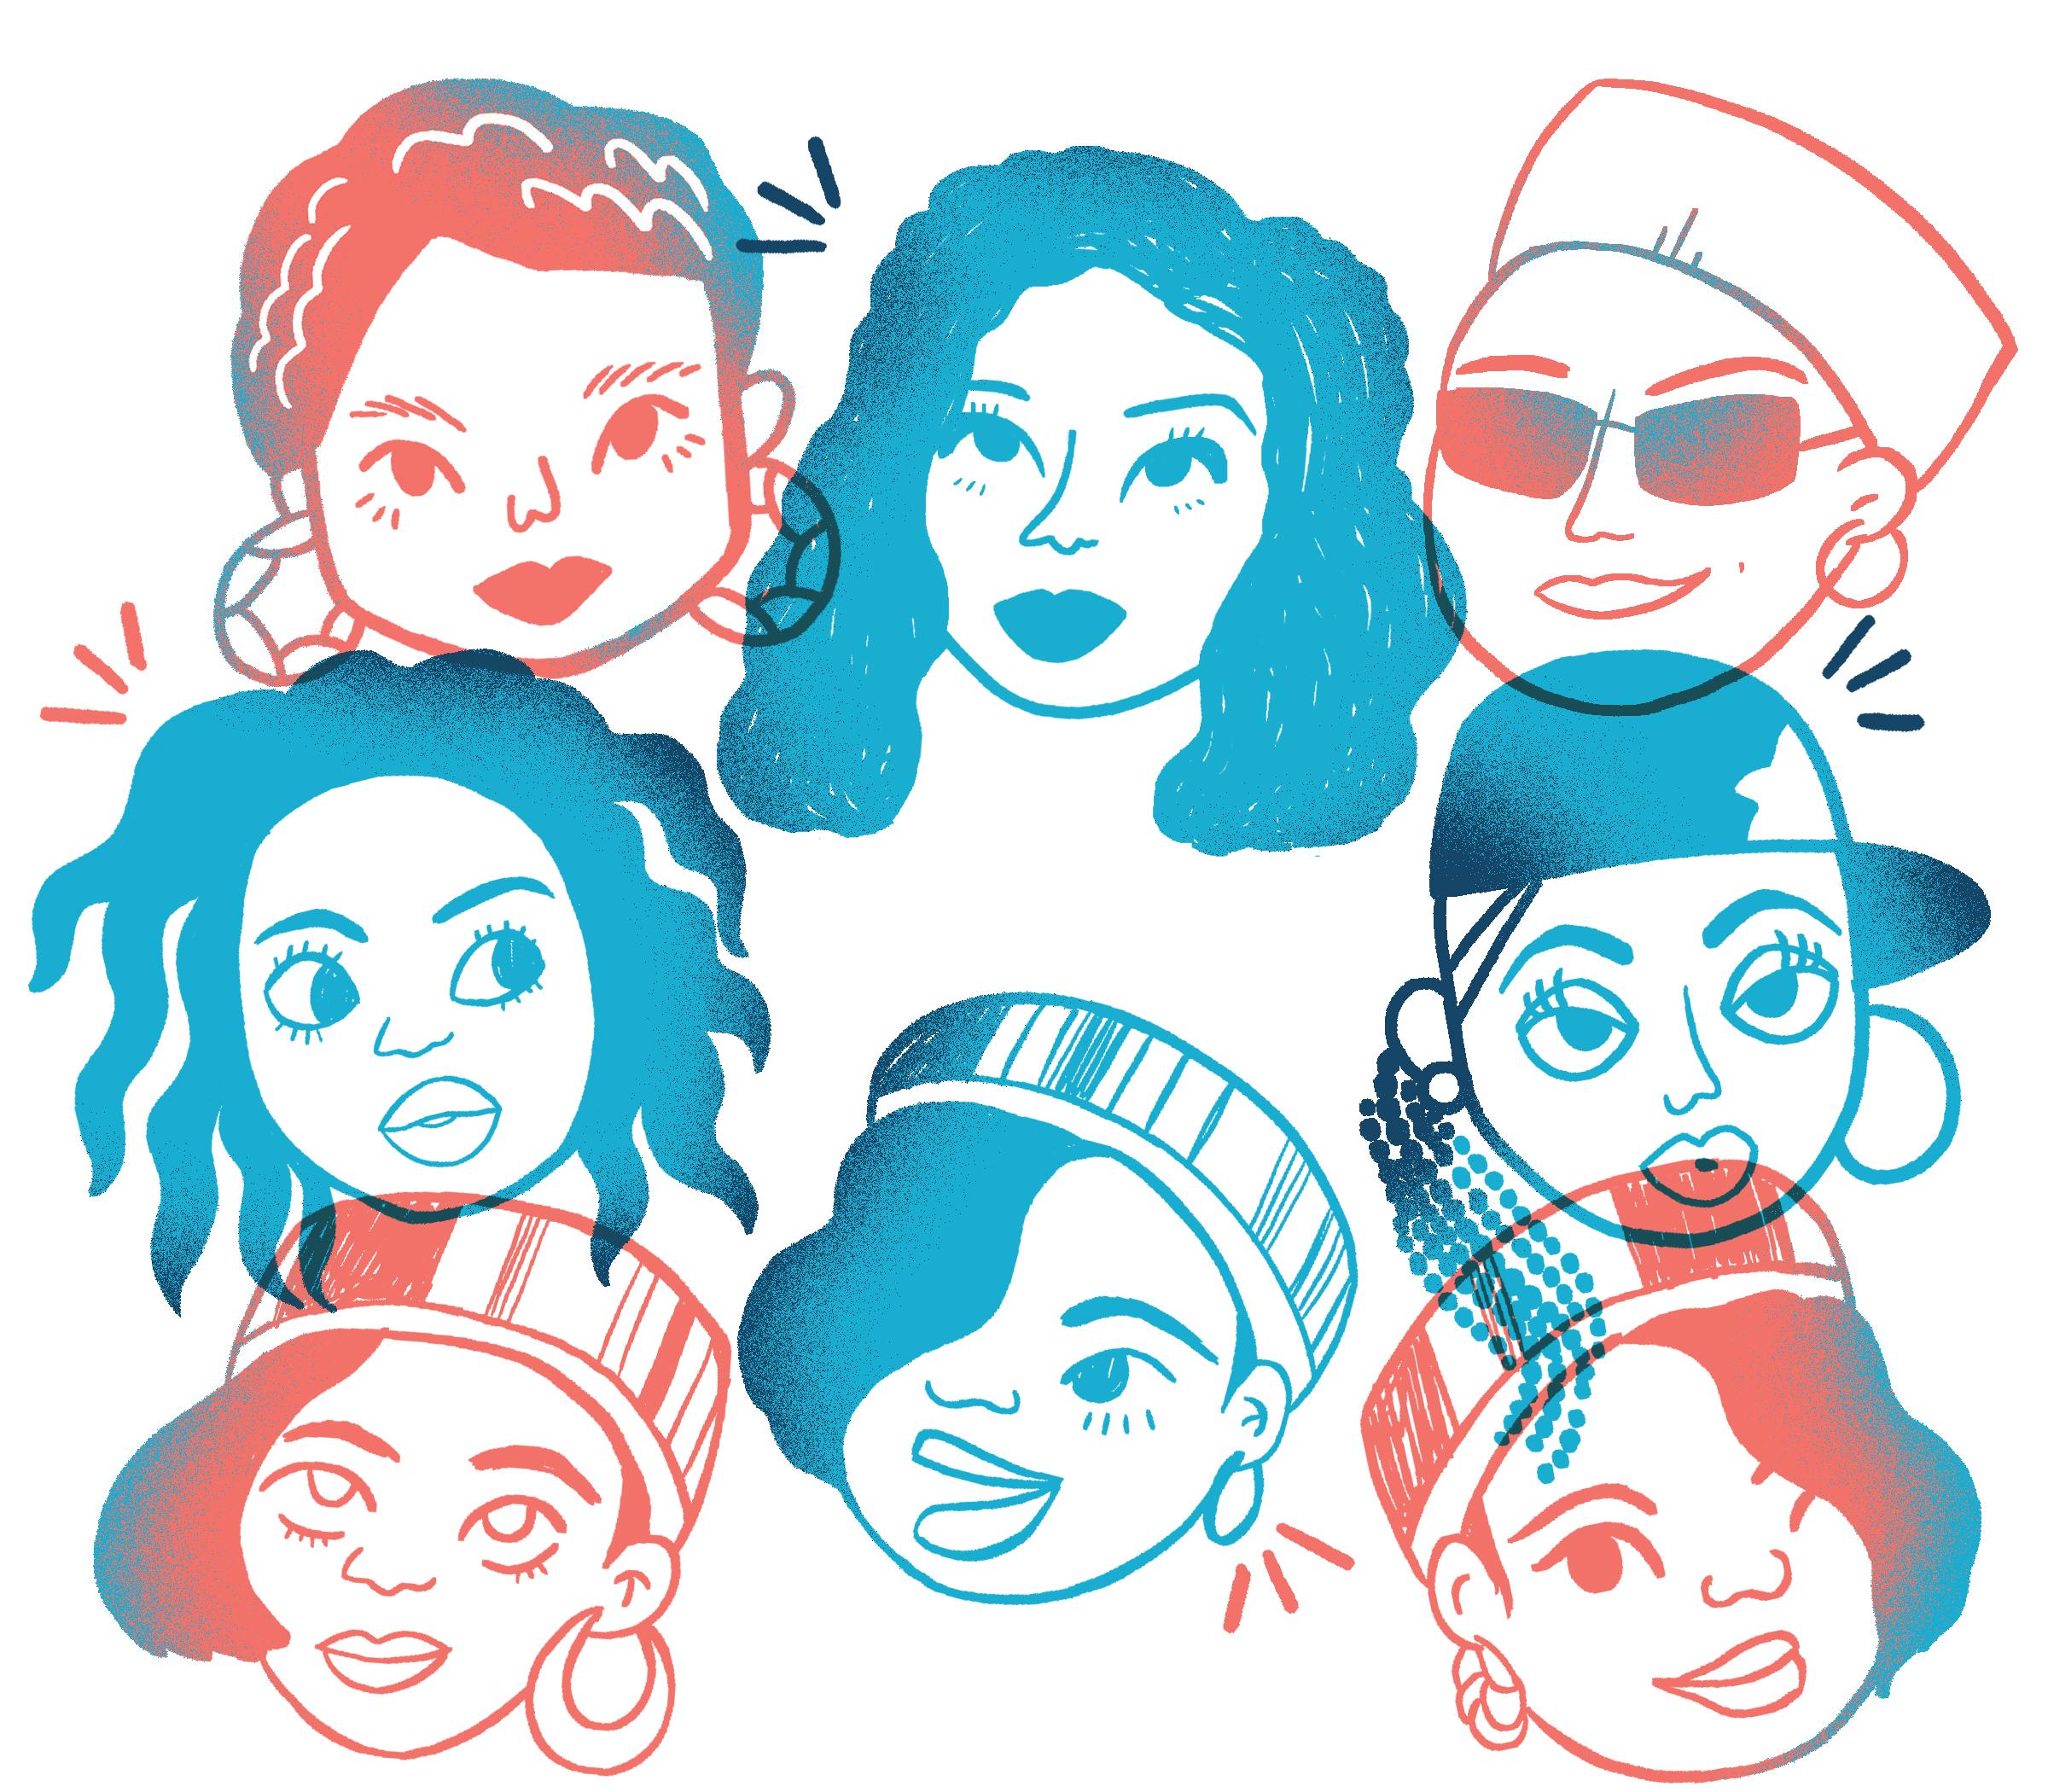 Portrait. First row, from left to right: Michie Mee, MC Lyte, Queen Latifah. Second row: Lauryn Hill, Missy Elliott. Third row: Salt, DJ Spinderella, Peppa